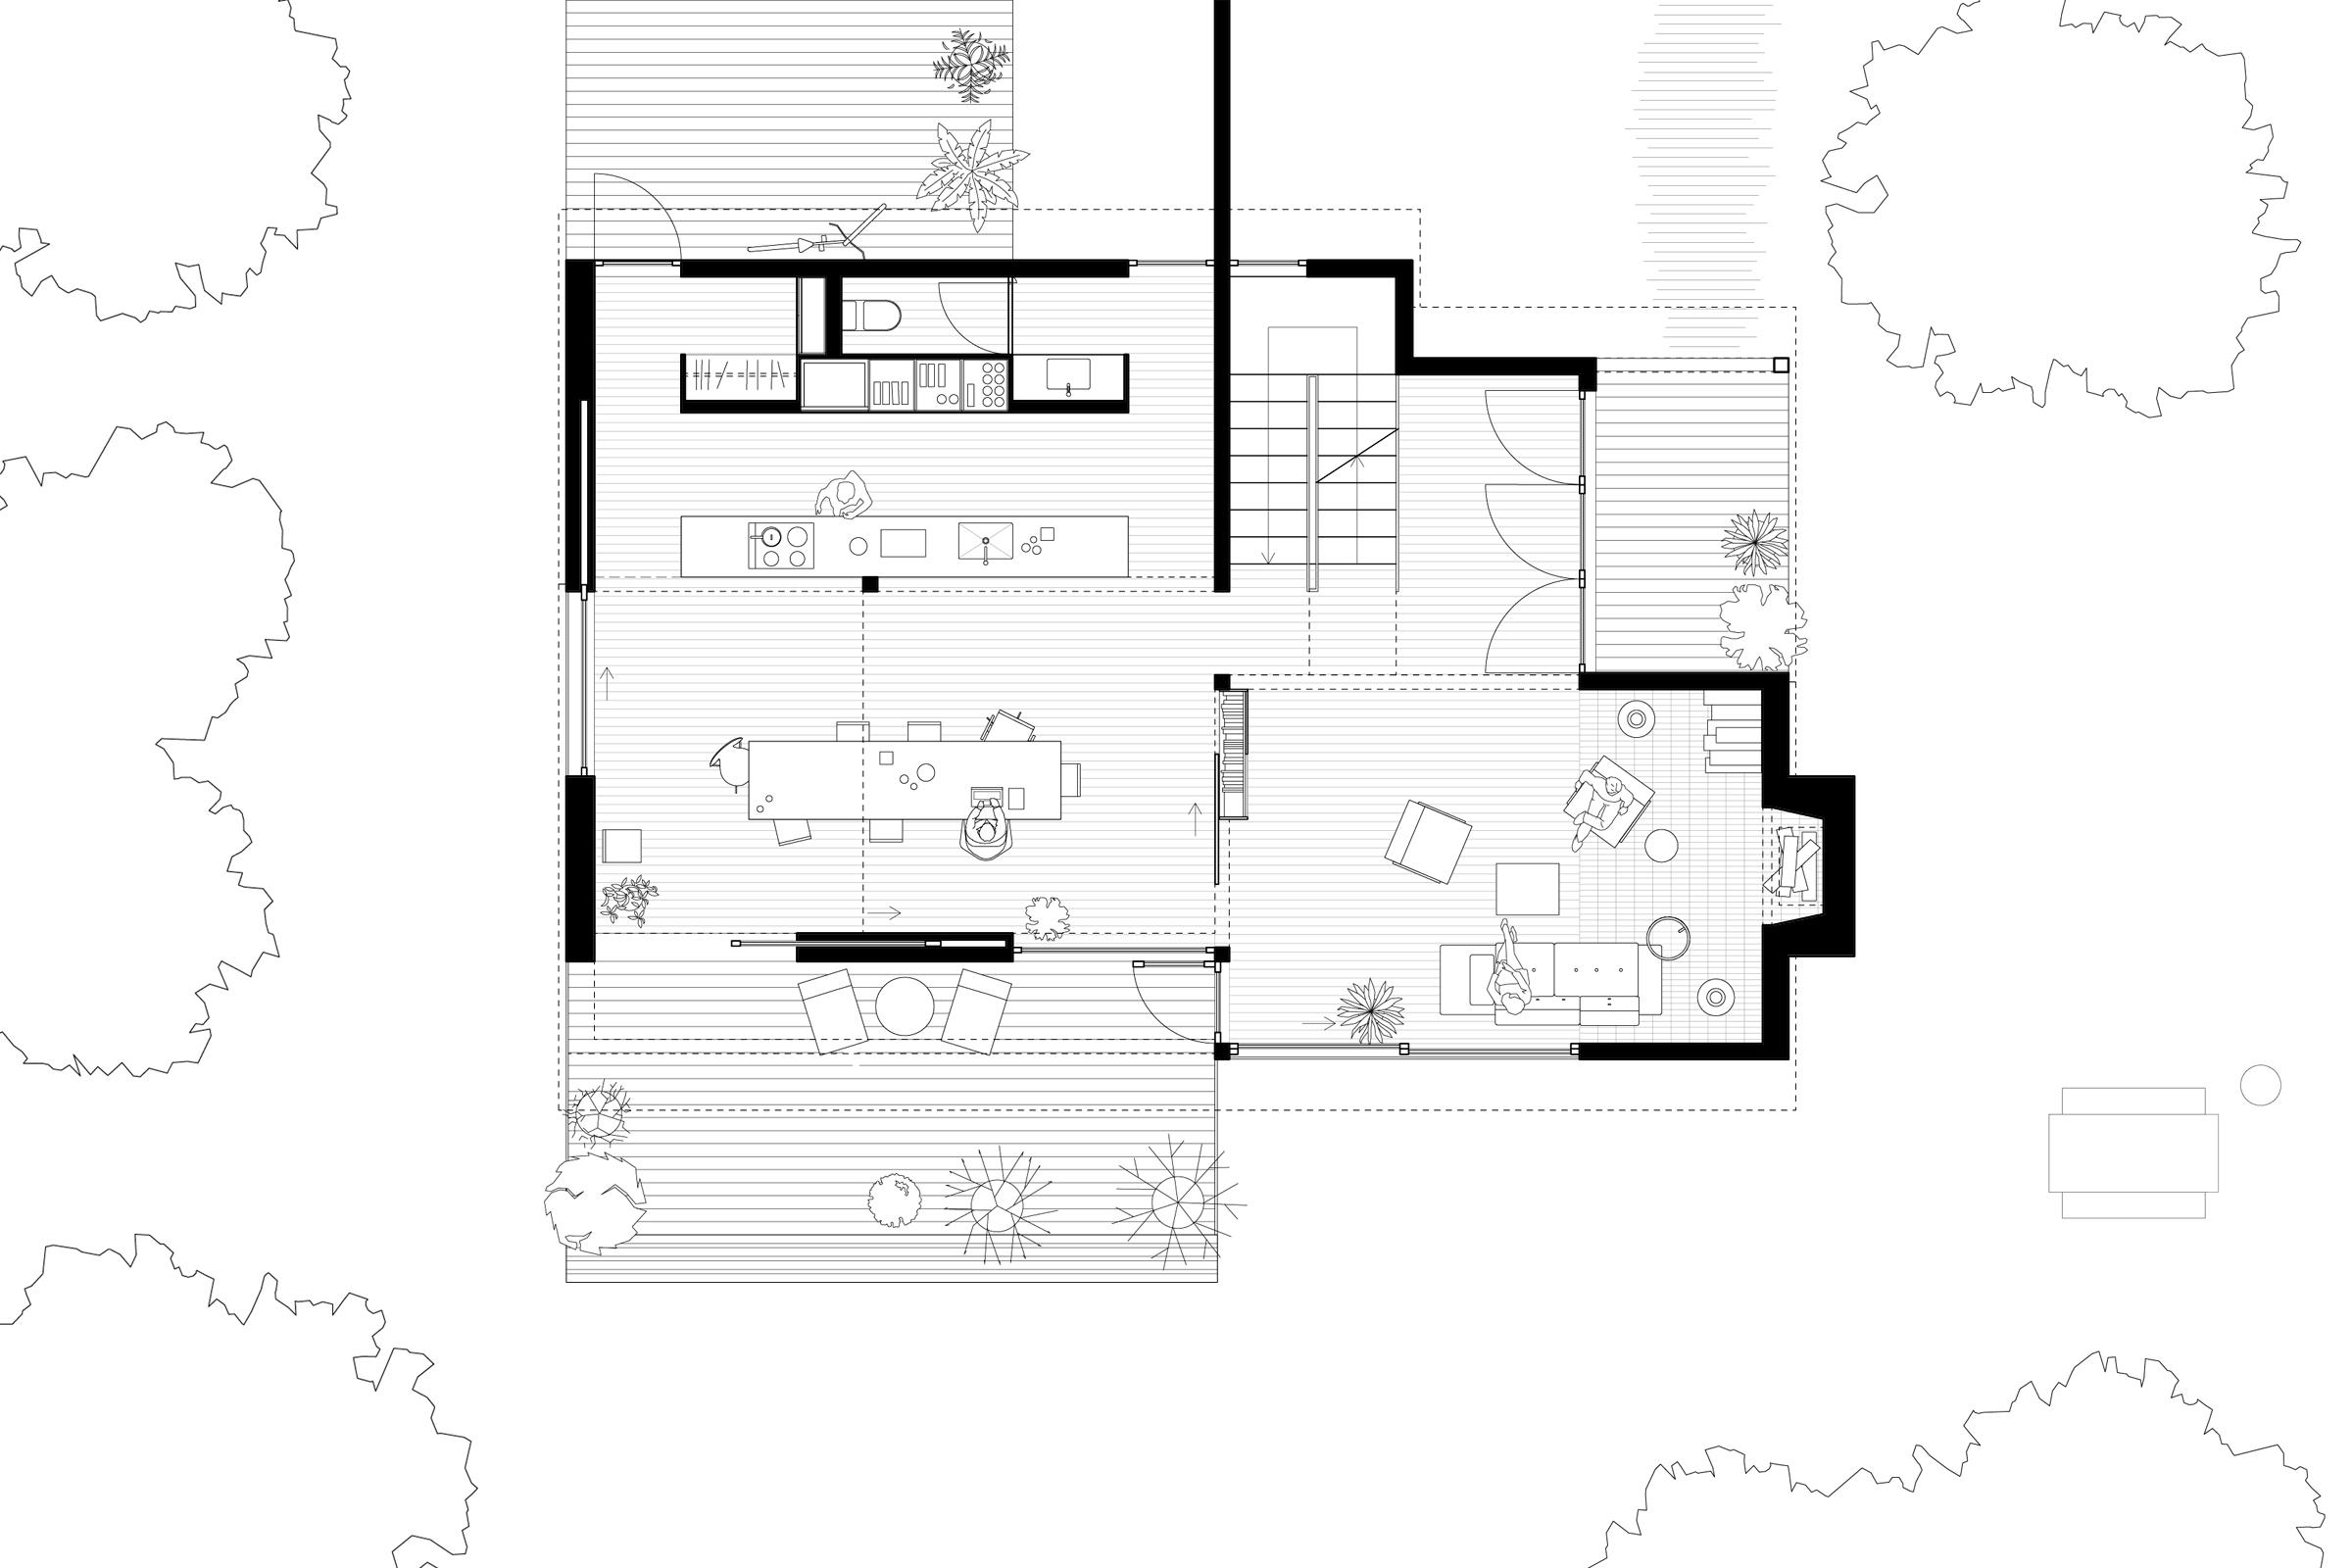 Oregon City House. Main level floor plan